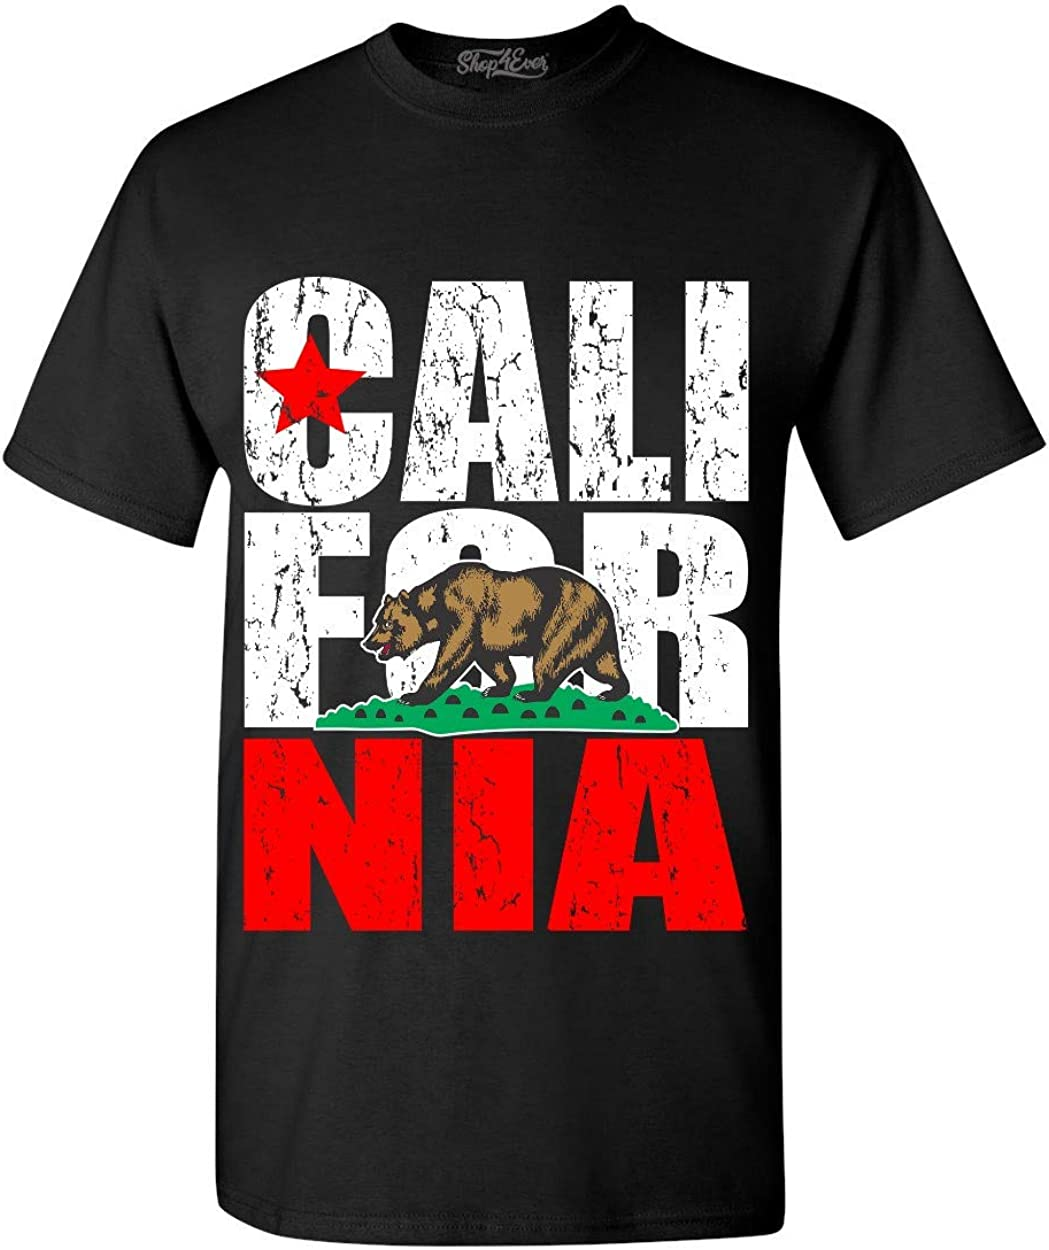 shop4ever California State Flag Bear T-Shirt